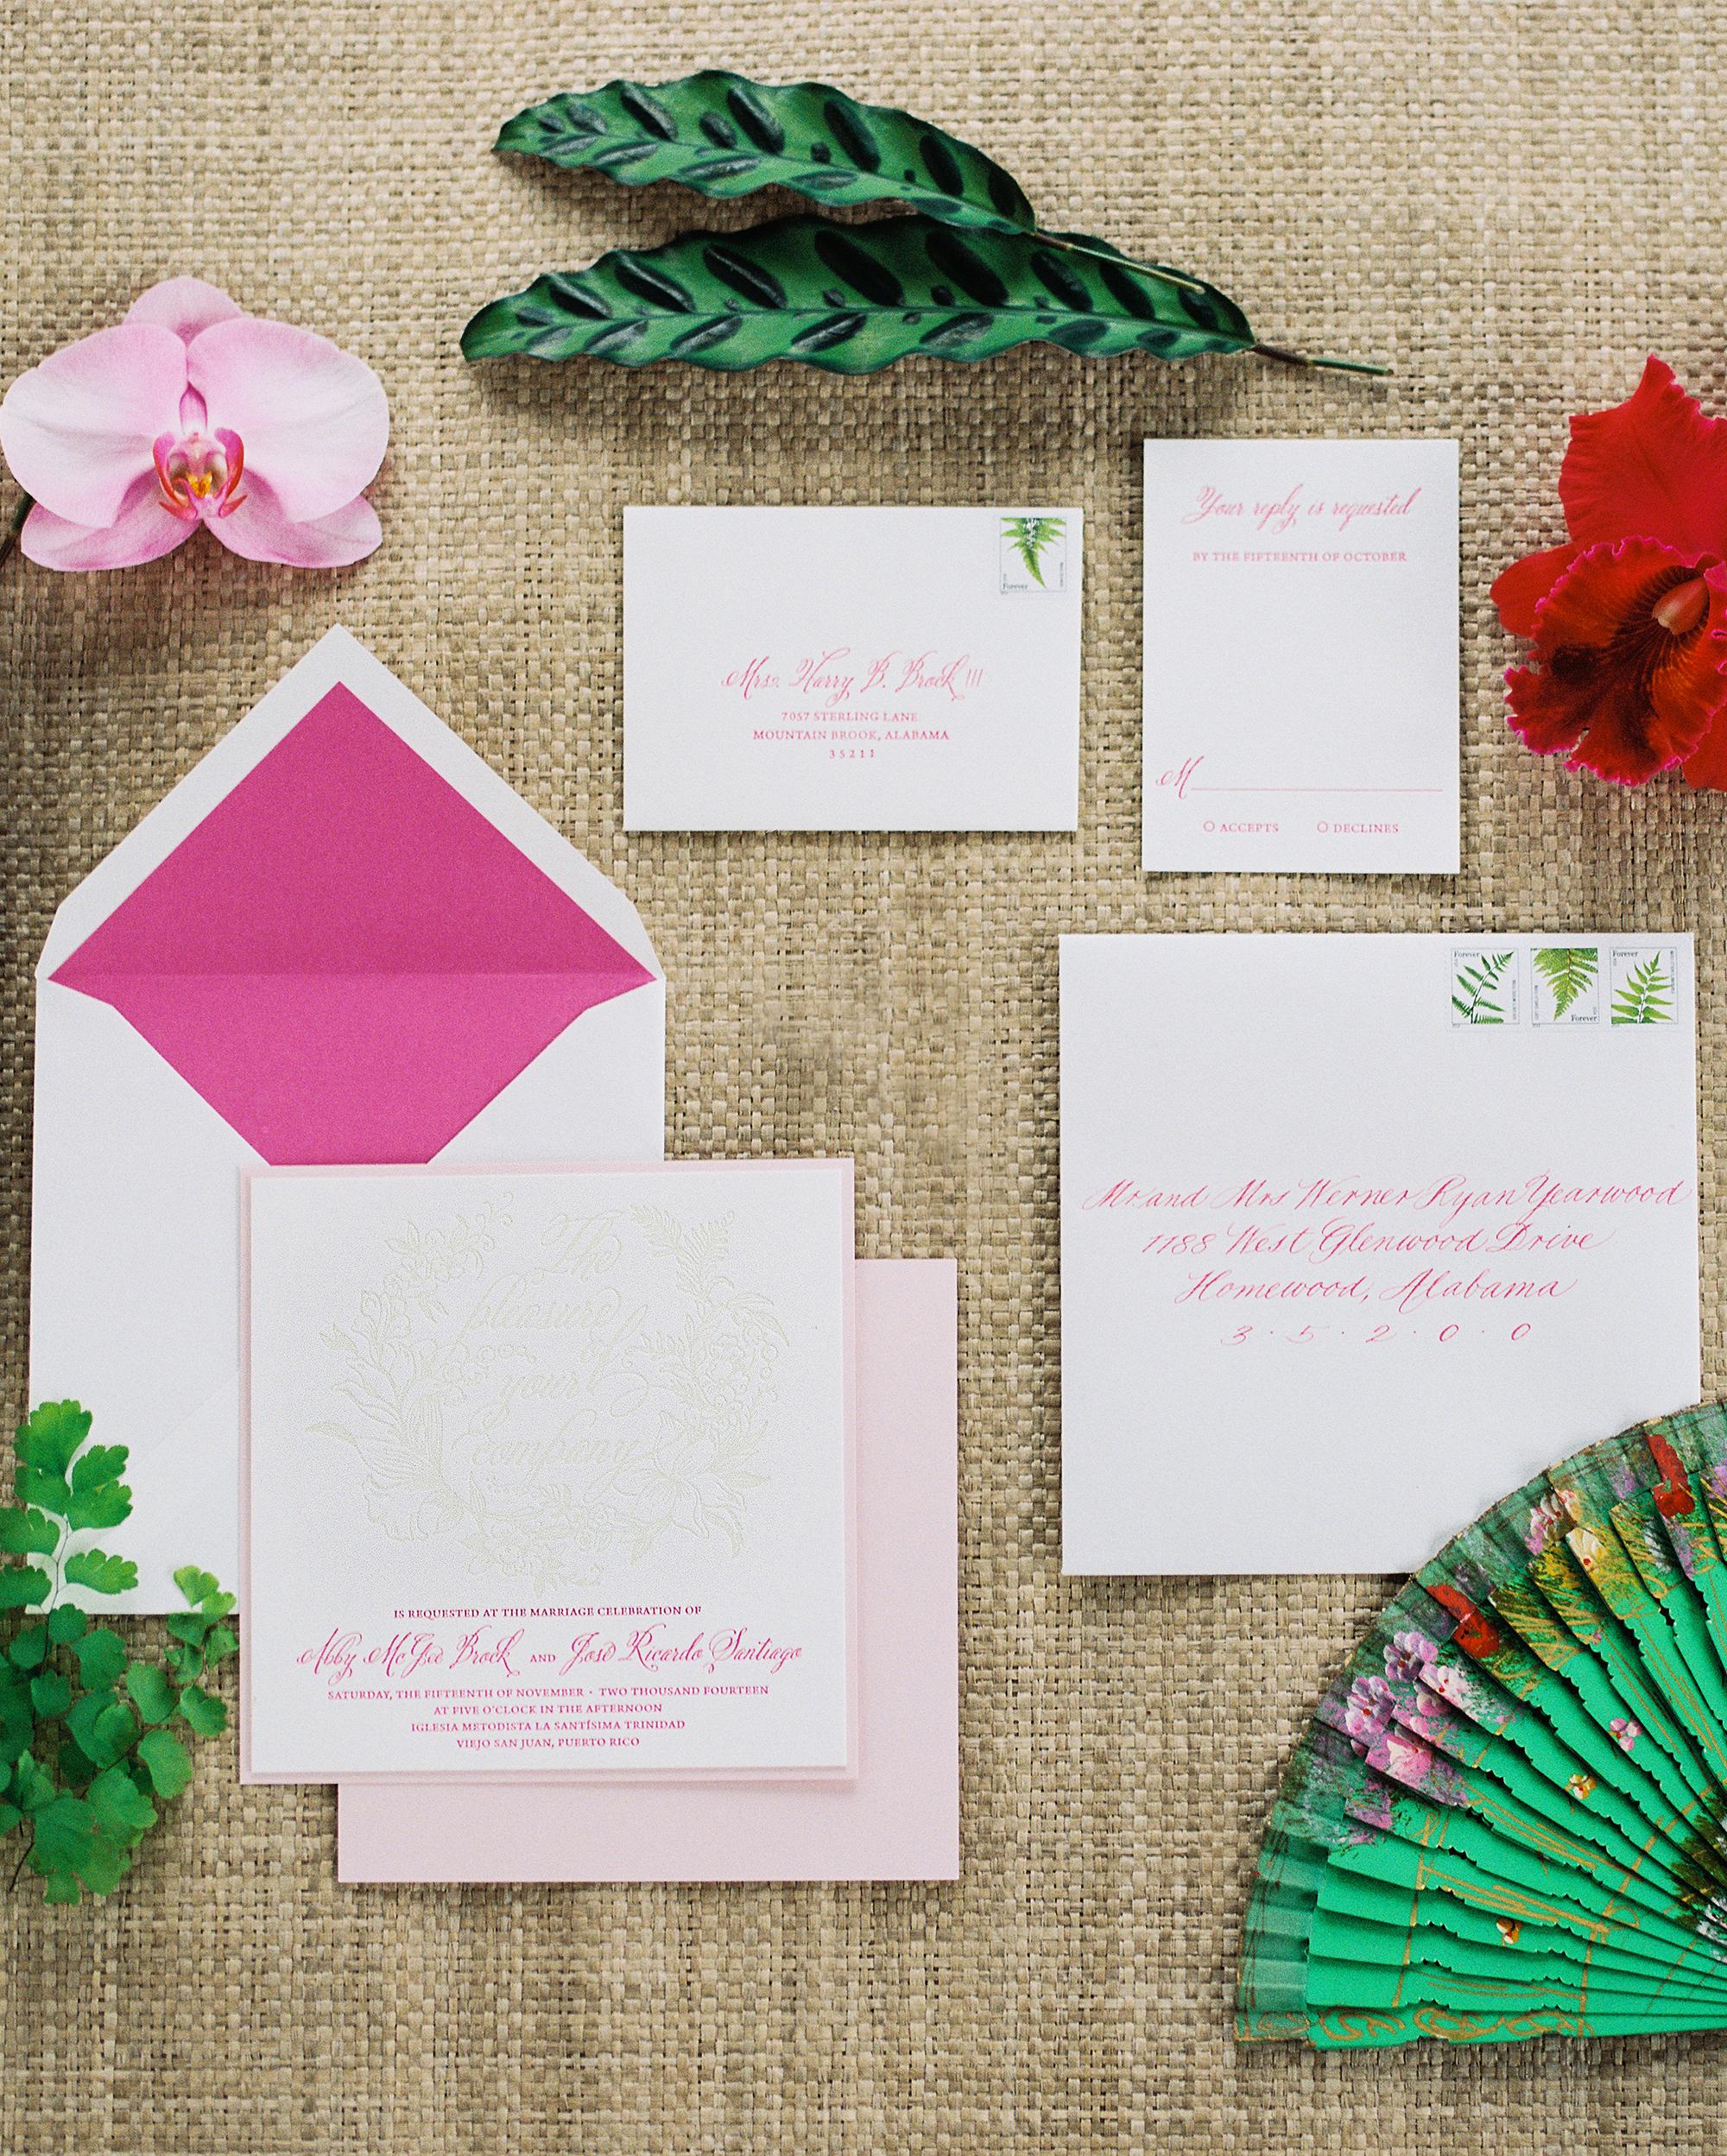 abby-jose-wedding-invite-094-s112118-0815.jpg